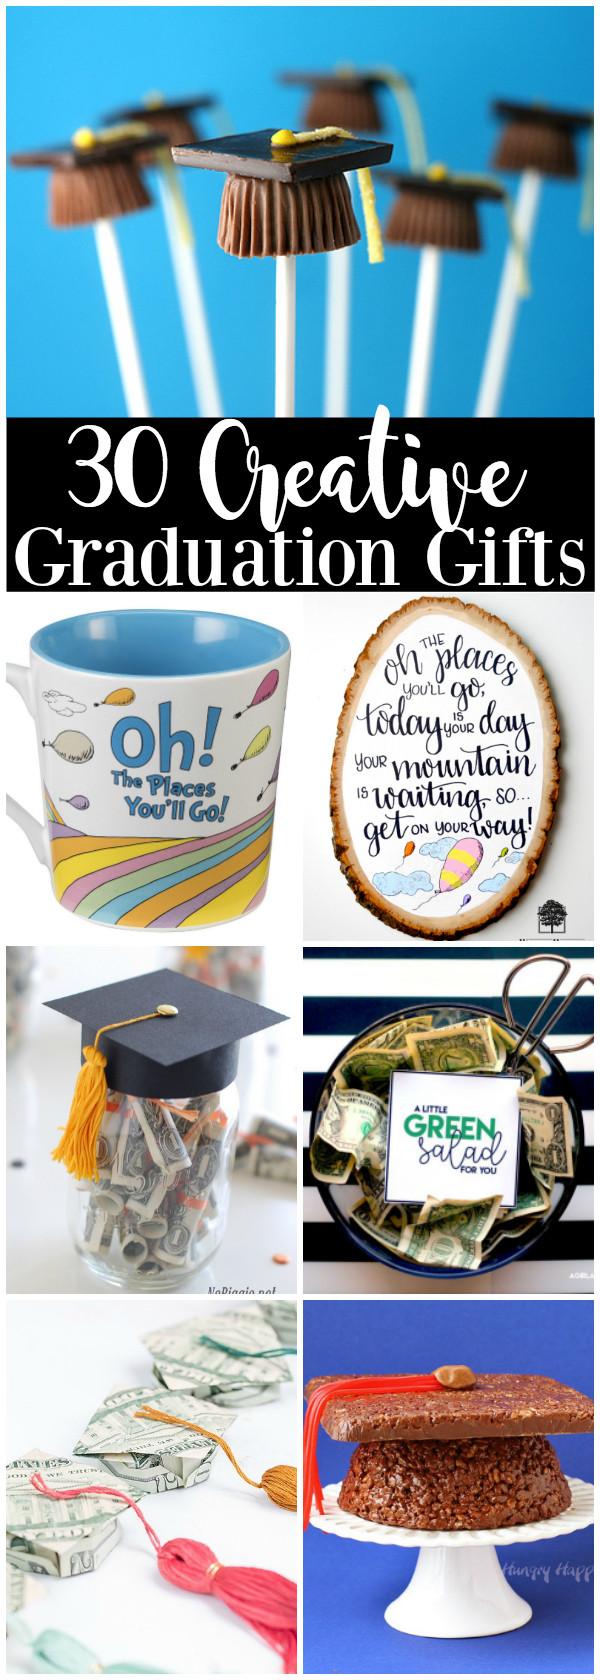 Graduation Gift Ideas Pinterest  30 Creative Graduation Gift Ideas